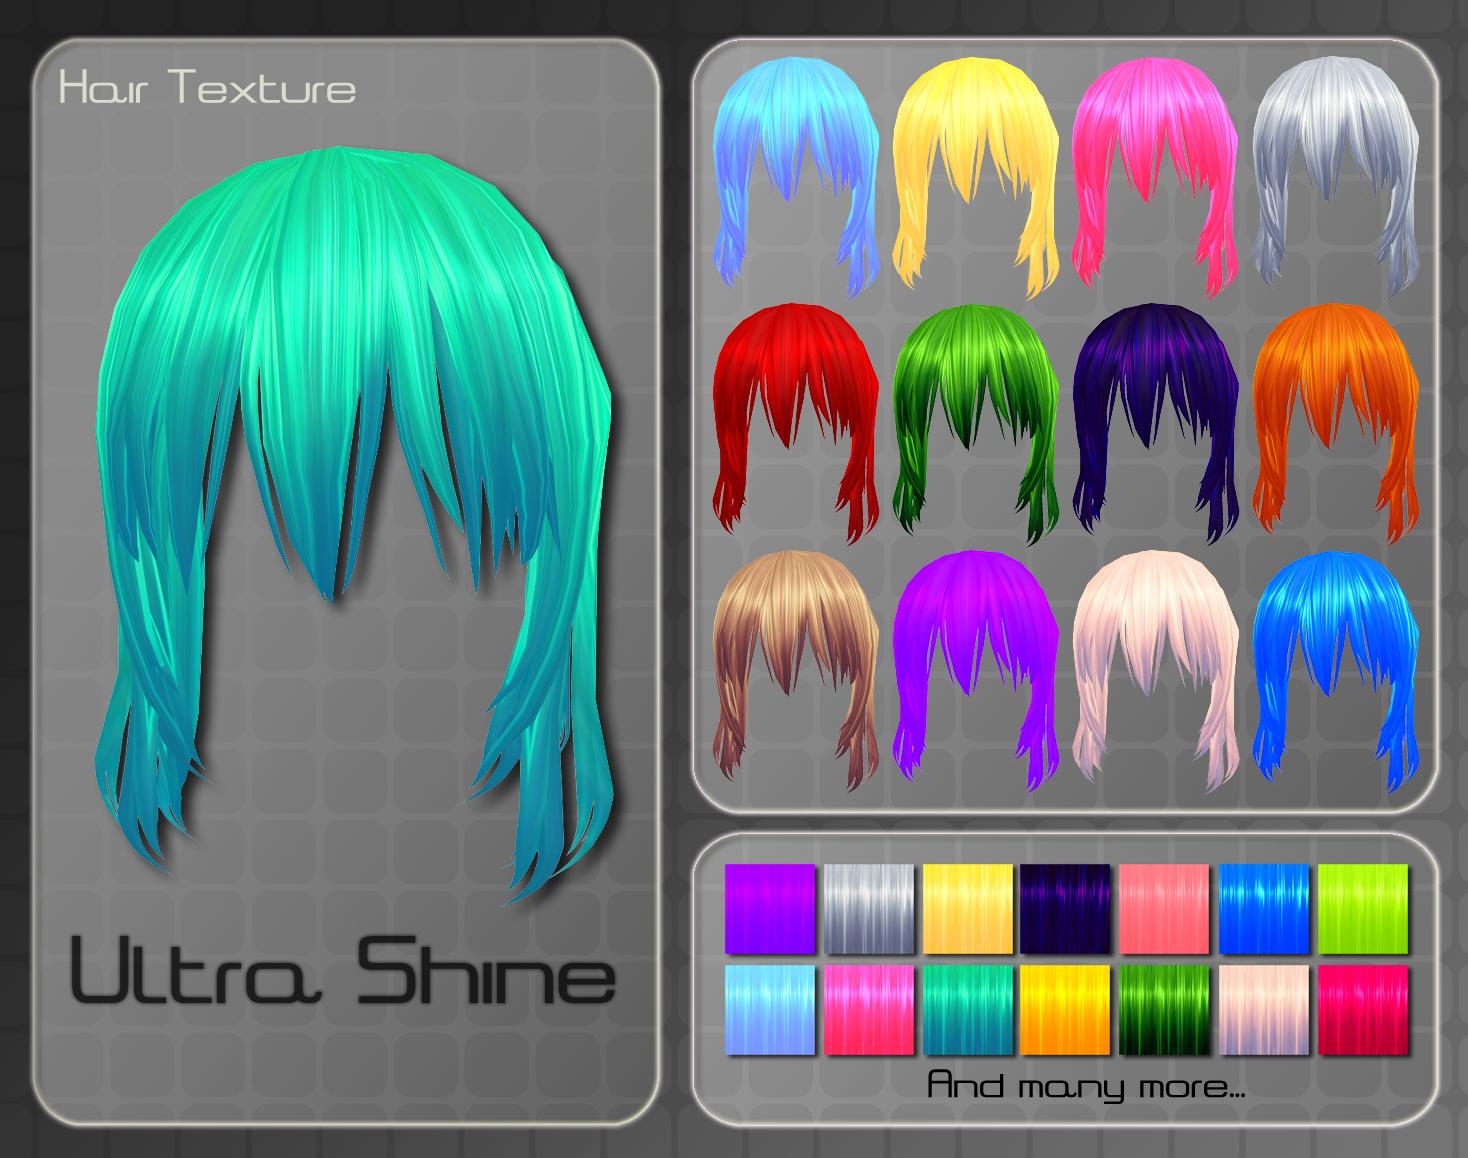 MMD Ultra Shine Hair Texture by Xoriu on DeviantArt